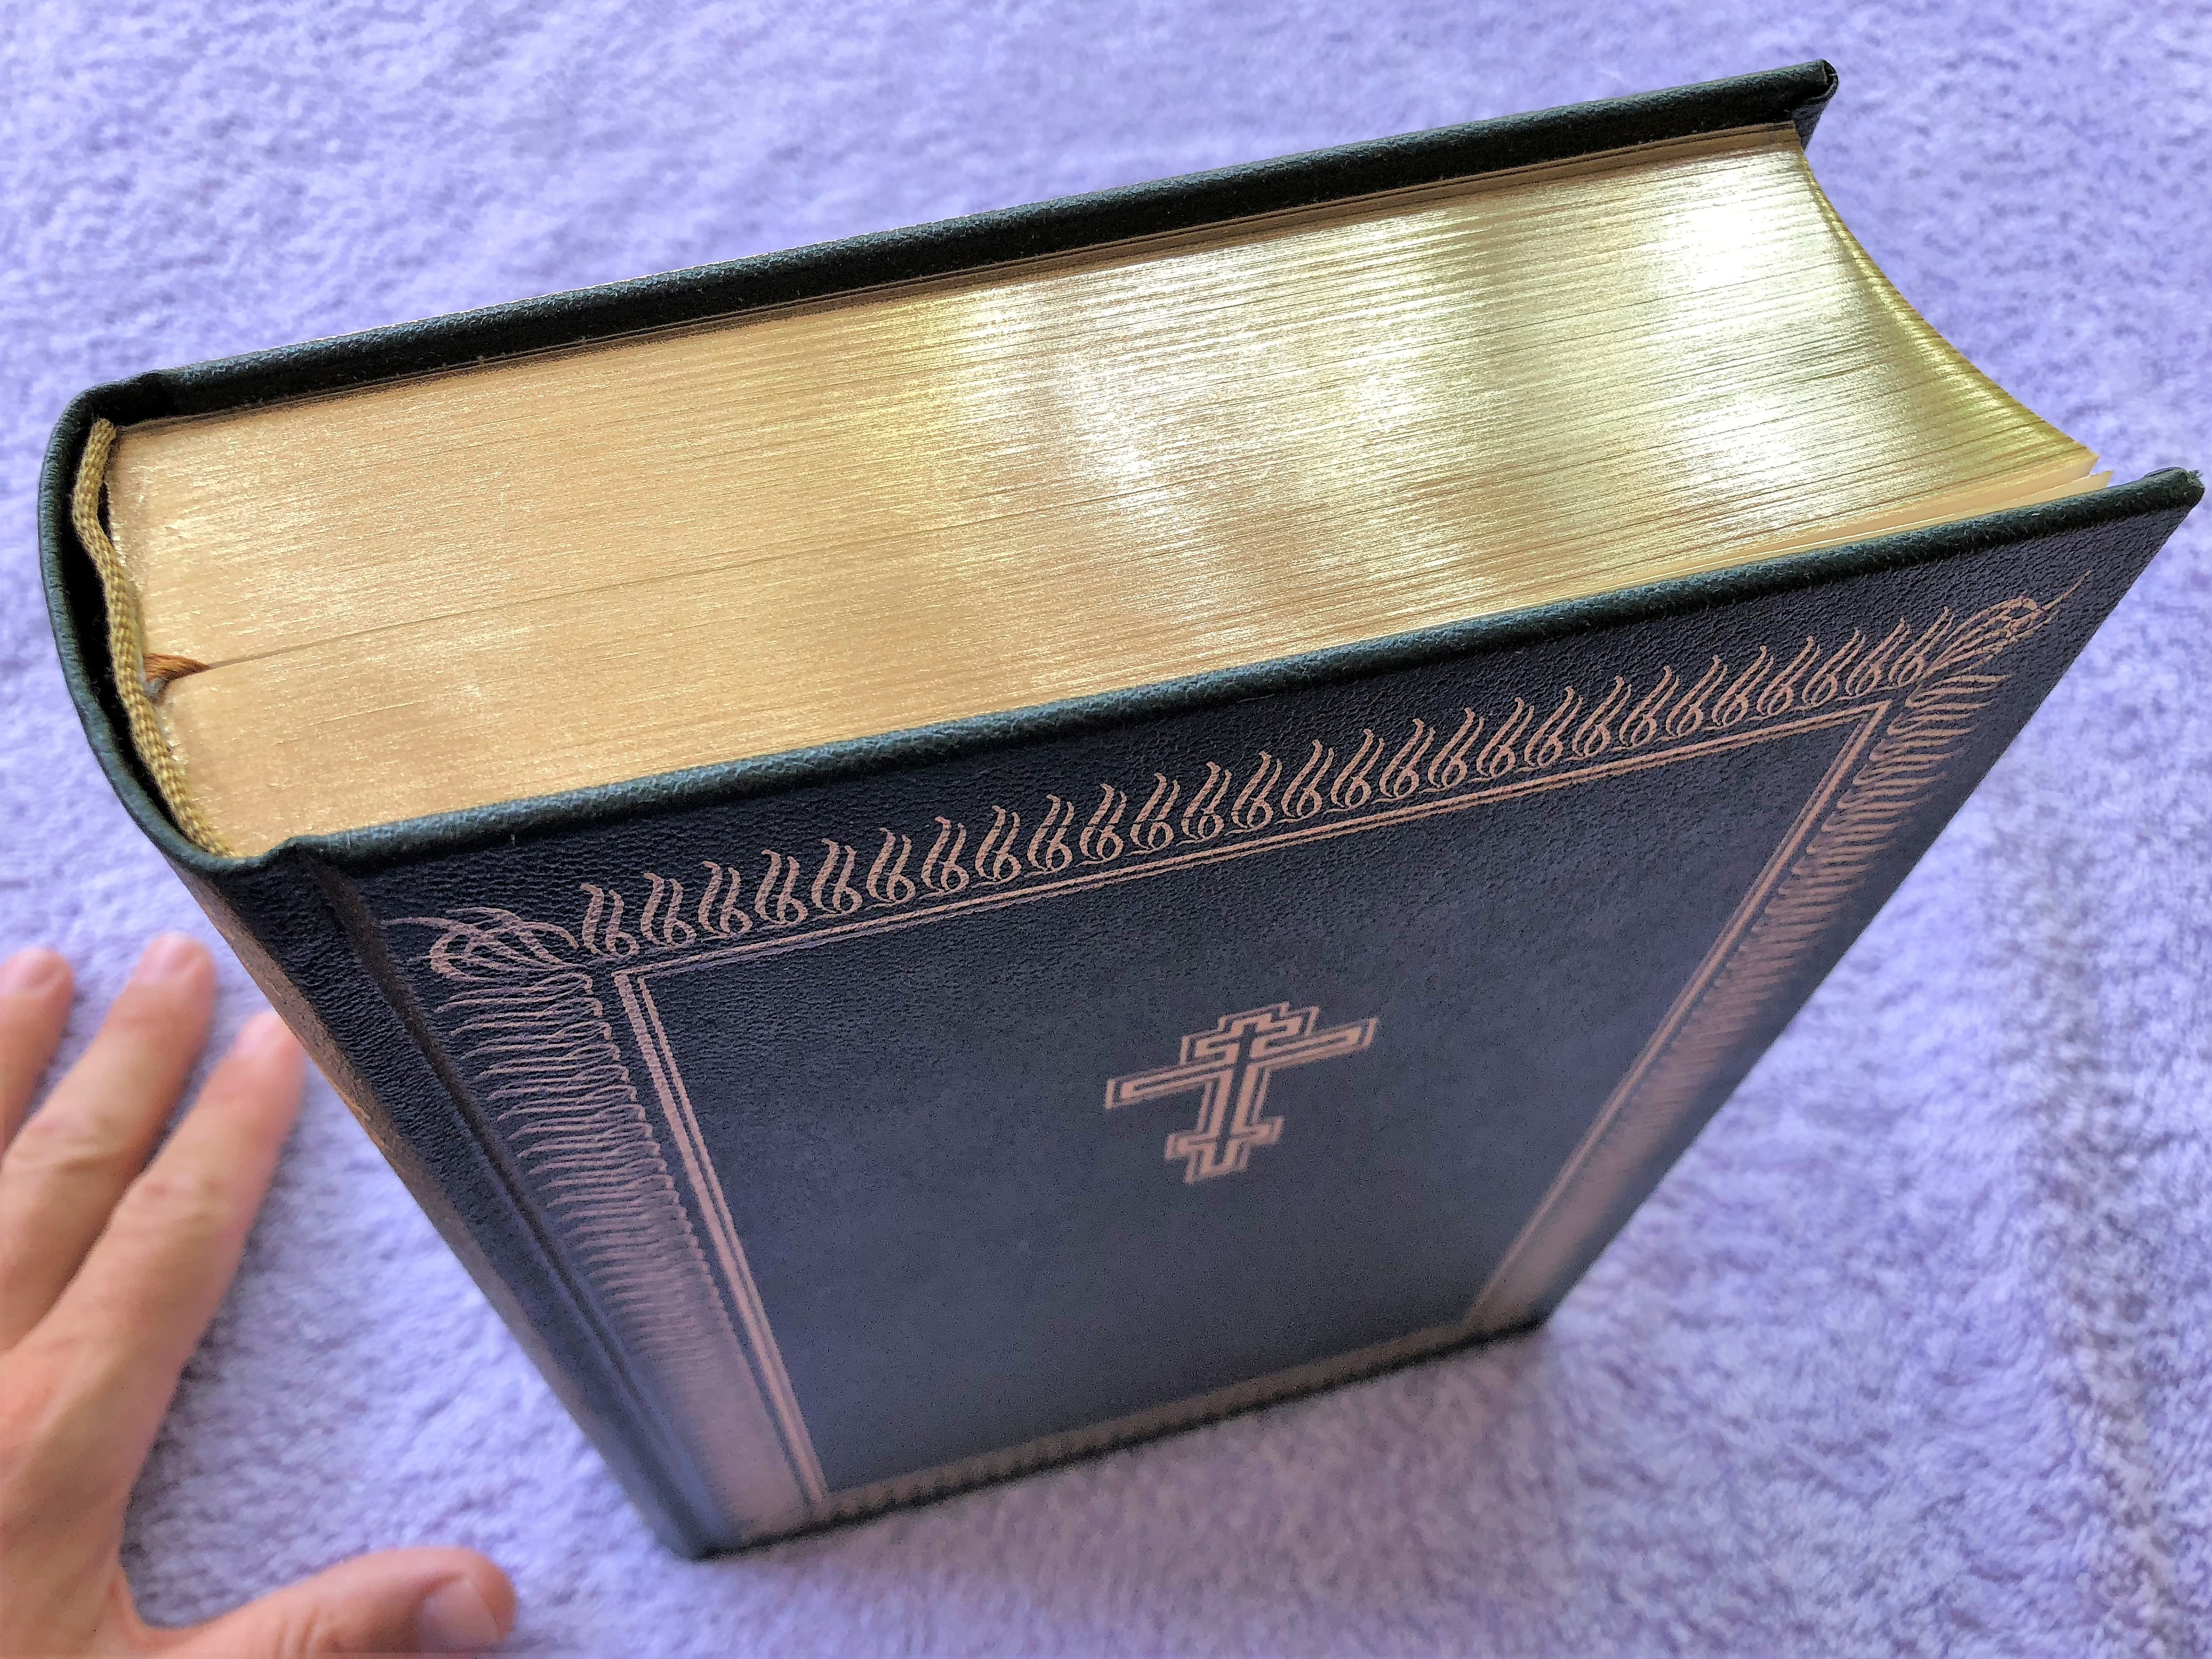 old-church-slavic-bible-beautiful-luxury-leather-bound-bible-green-27-.jpg